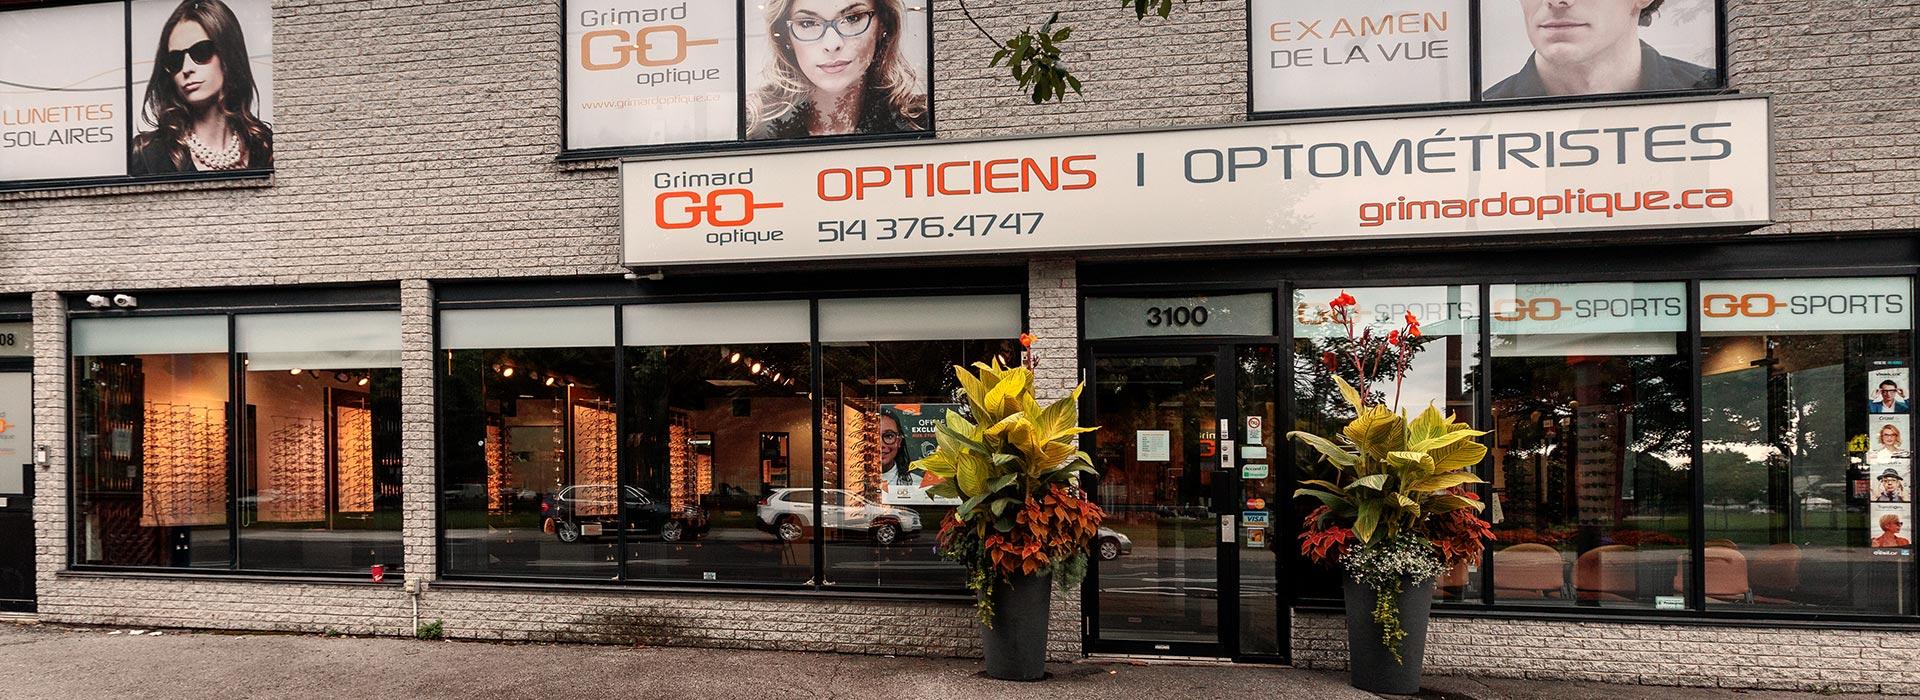 Grimard Optique lunetterie succursale Beaubien